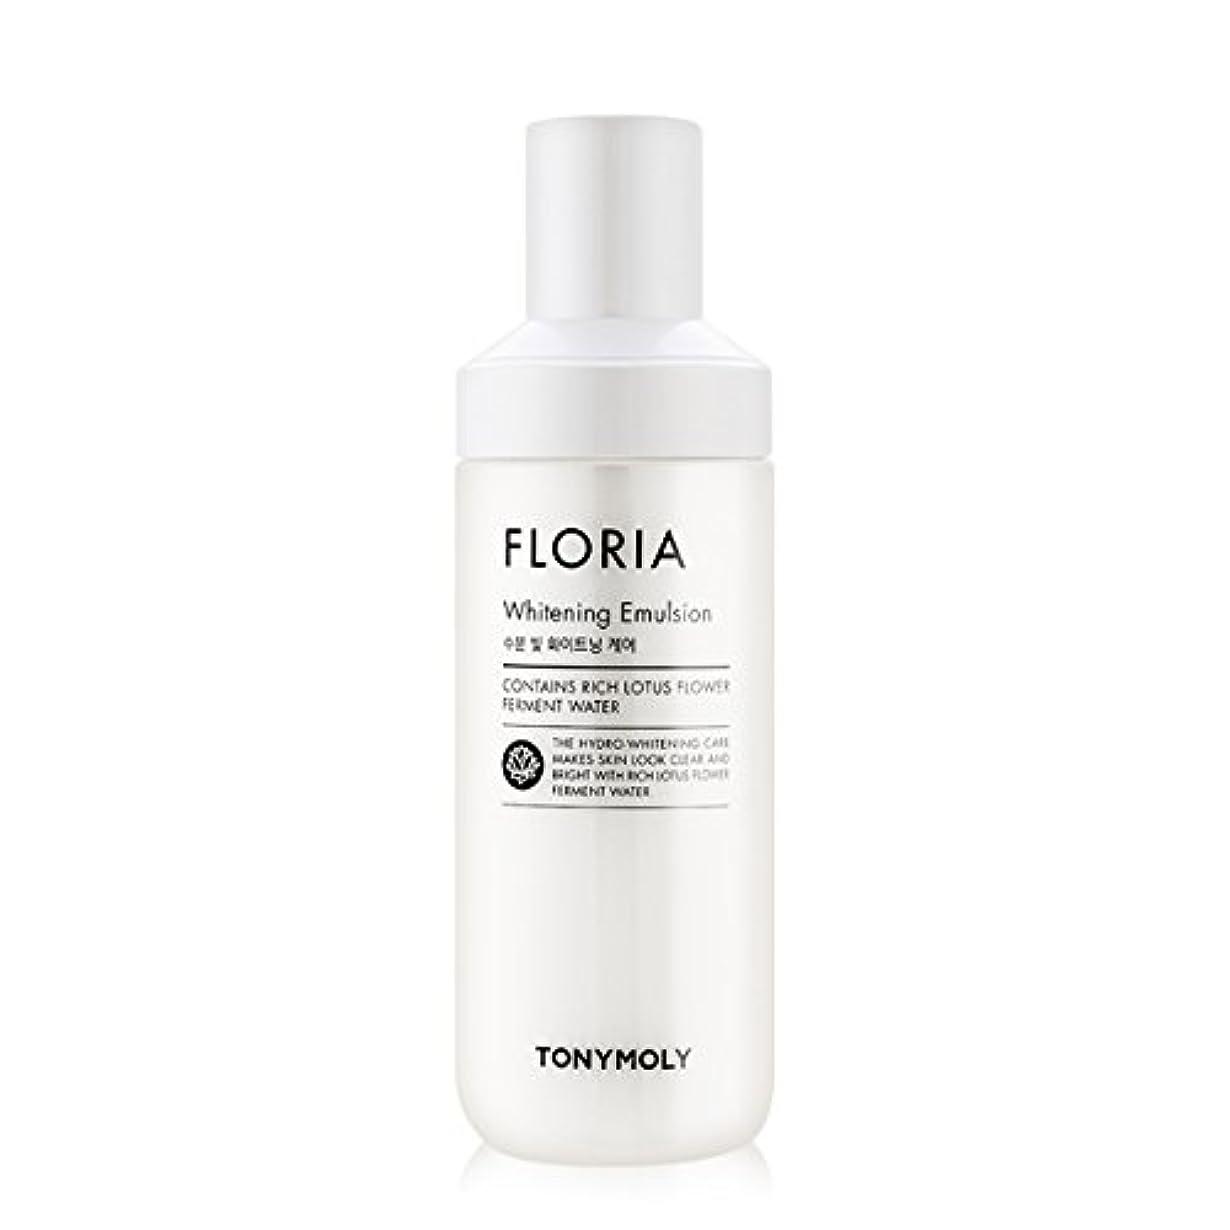 [2016 New] TONYMOLY Floria Whitening Emulsion 160ml/トニーモリー フロリア ホワイトニング エマルジョン 160ml [並行輸入品]